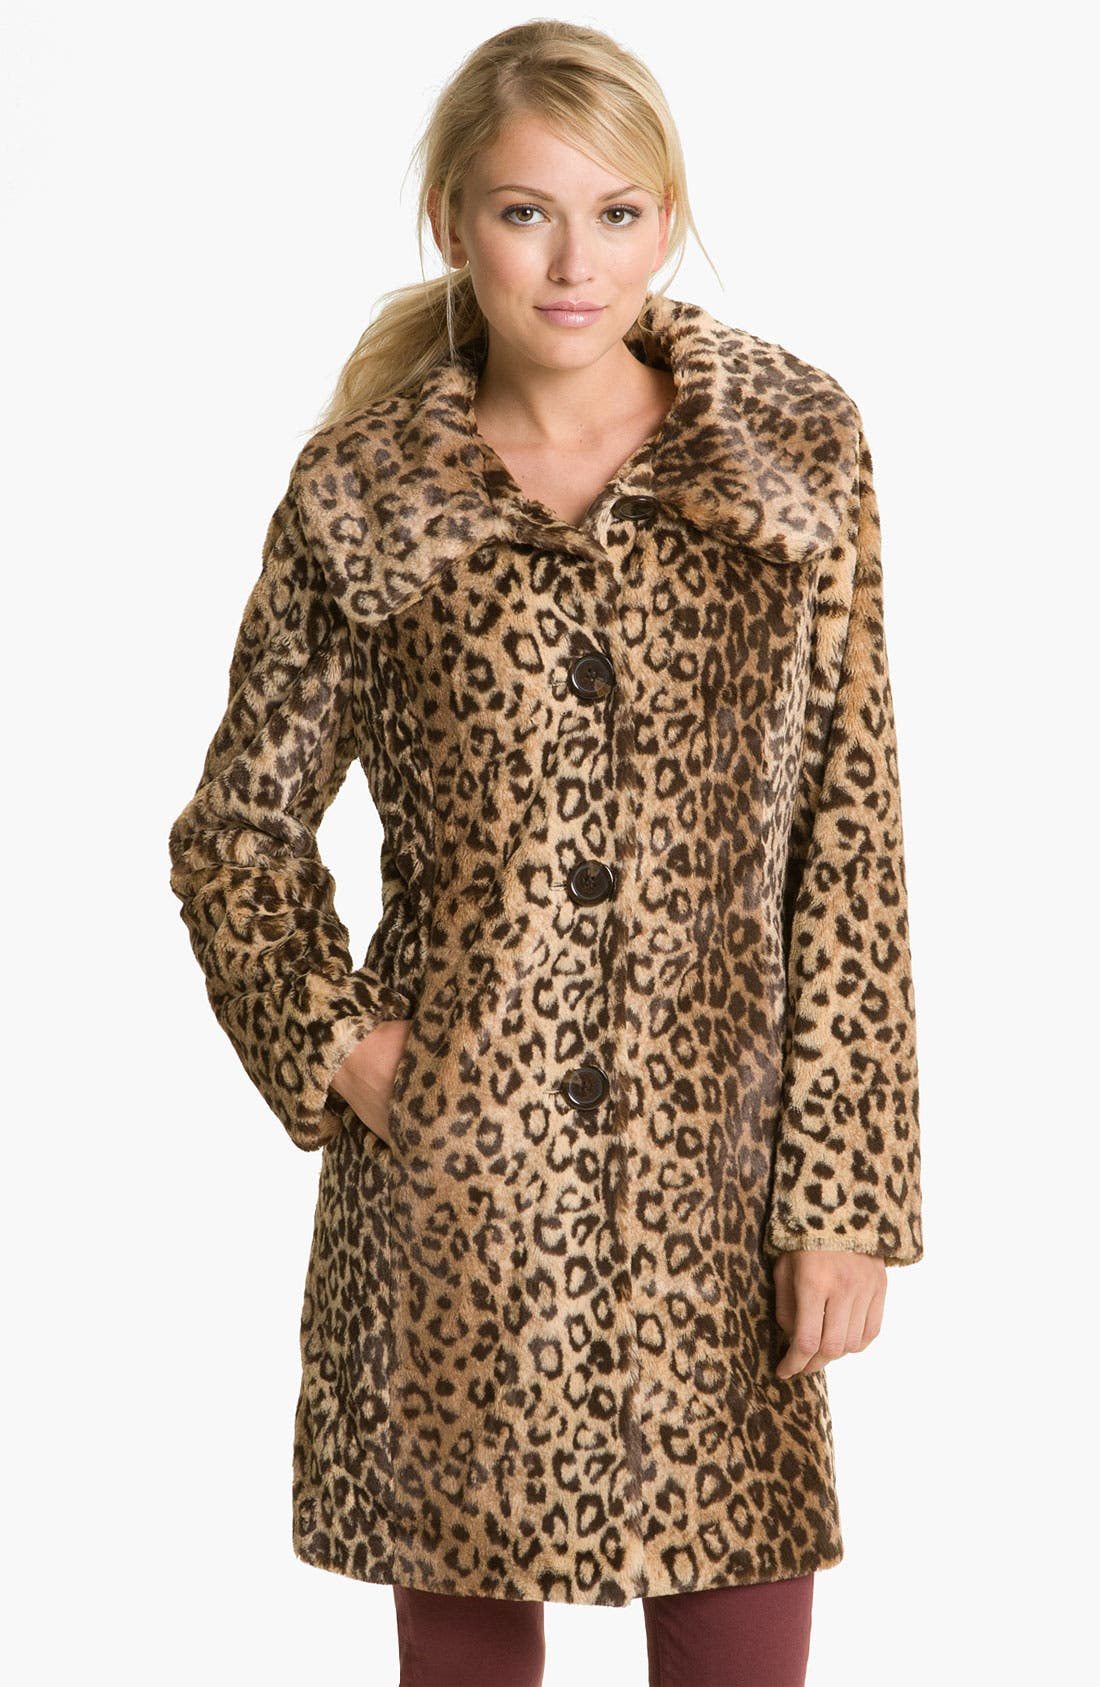 Alternate Image 1 Selected - Weatherproof® Faux Leopard Fur Walking Coat (Online Exclusive)